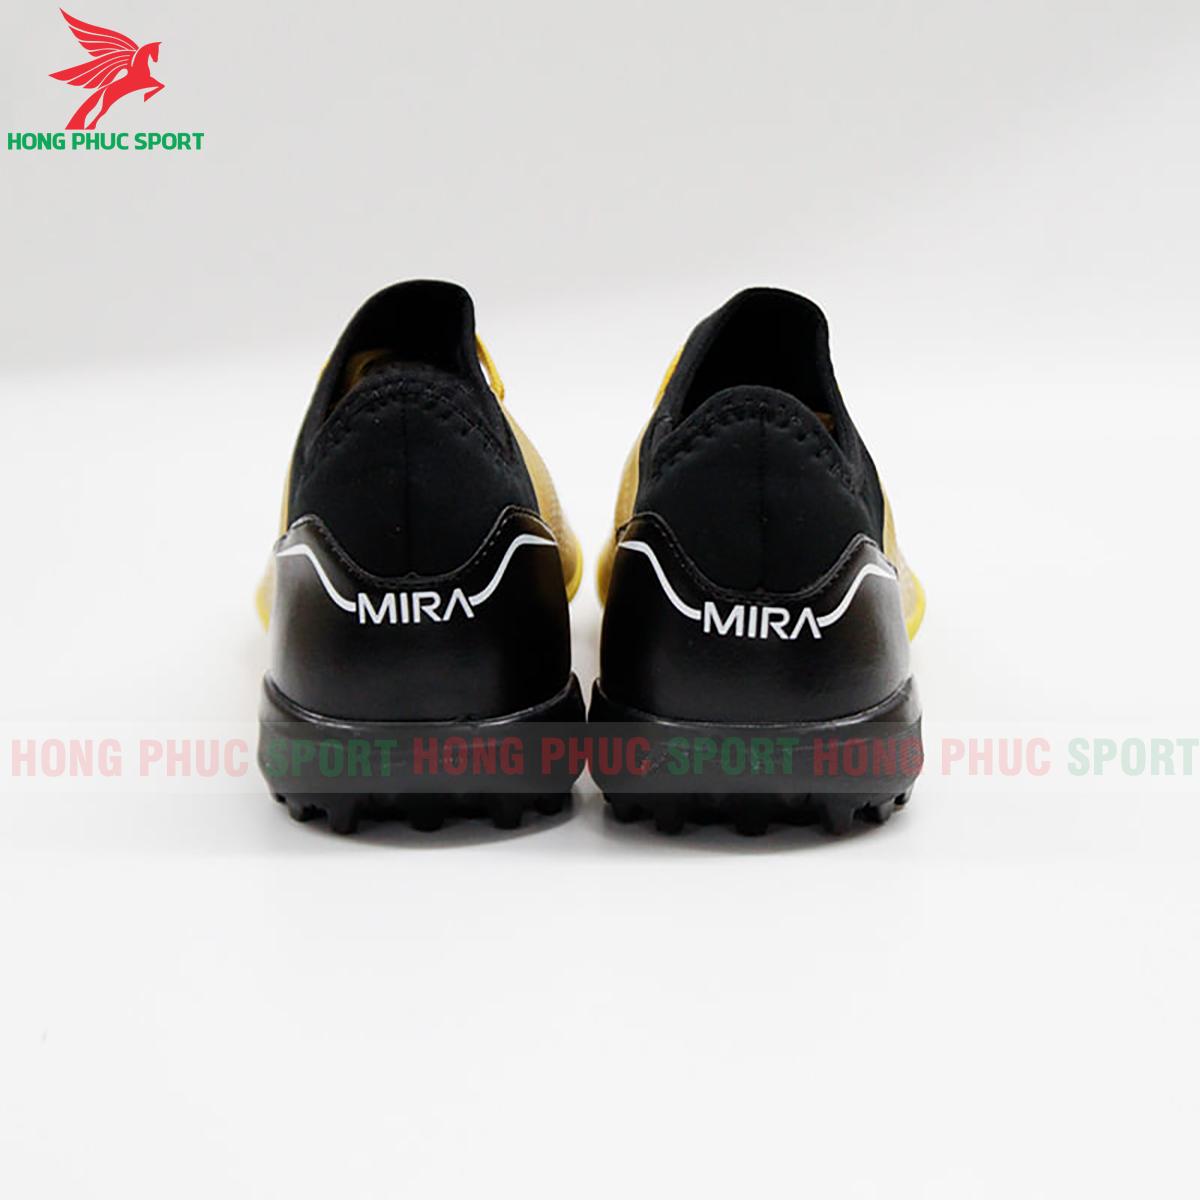 https://cdn.hongphucsport.com/unsafe/s4.shopbay.vn/files/285/giay-da-bong-mira-lux-20-3-mau-vang-phoi-den-6-5f74018a5e214.png